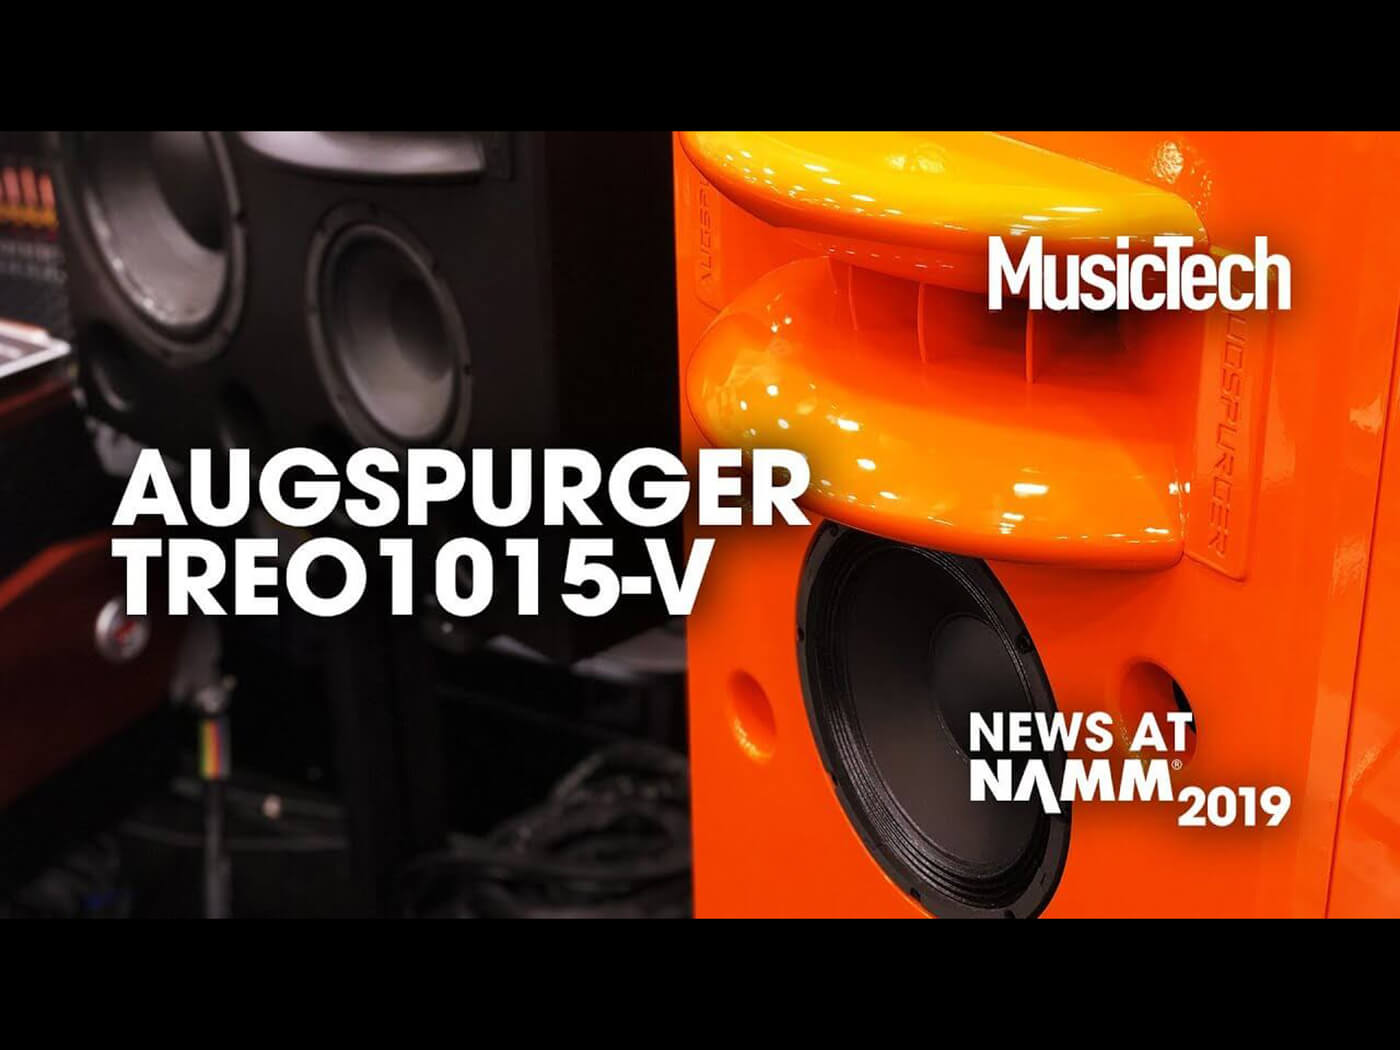 NAMM 2019: News, rumours and previews - MusicTech